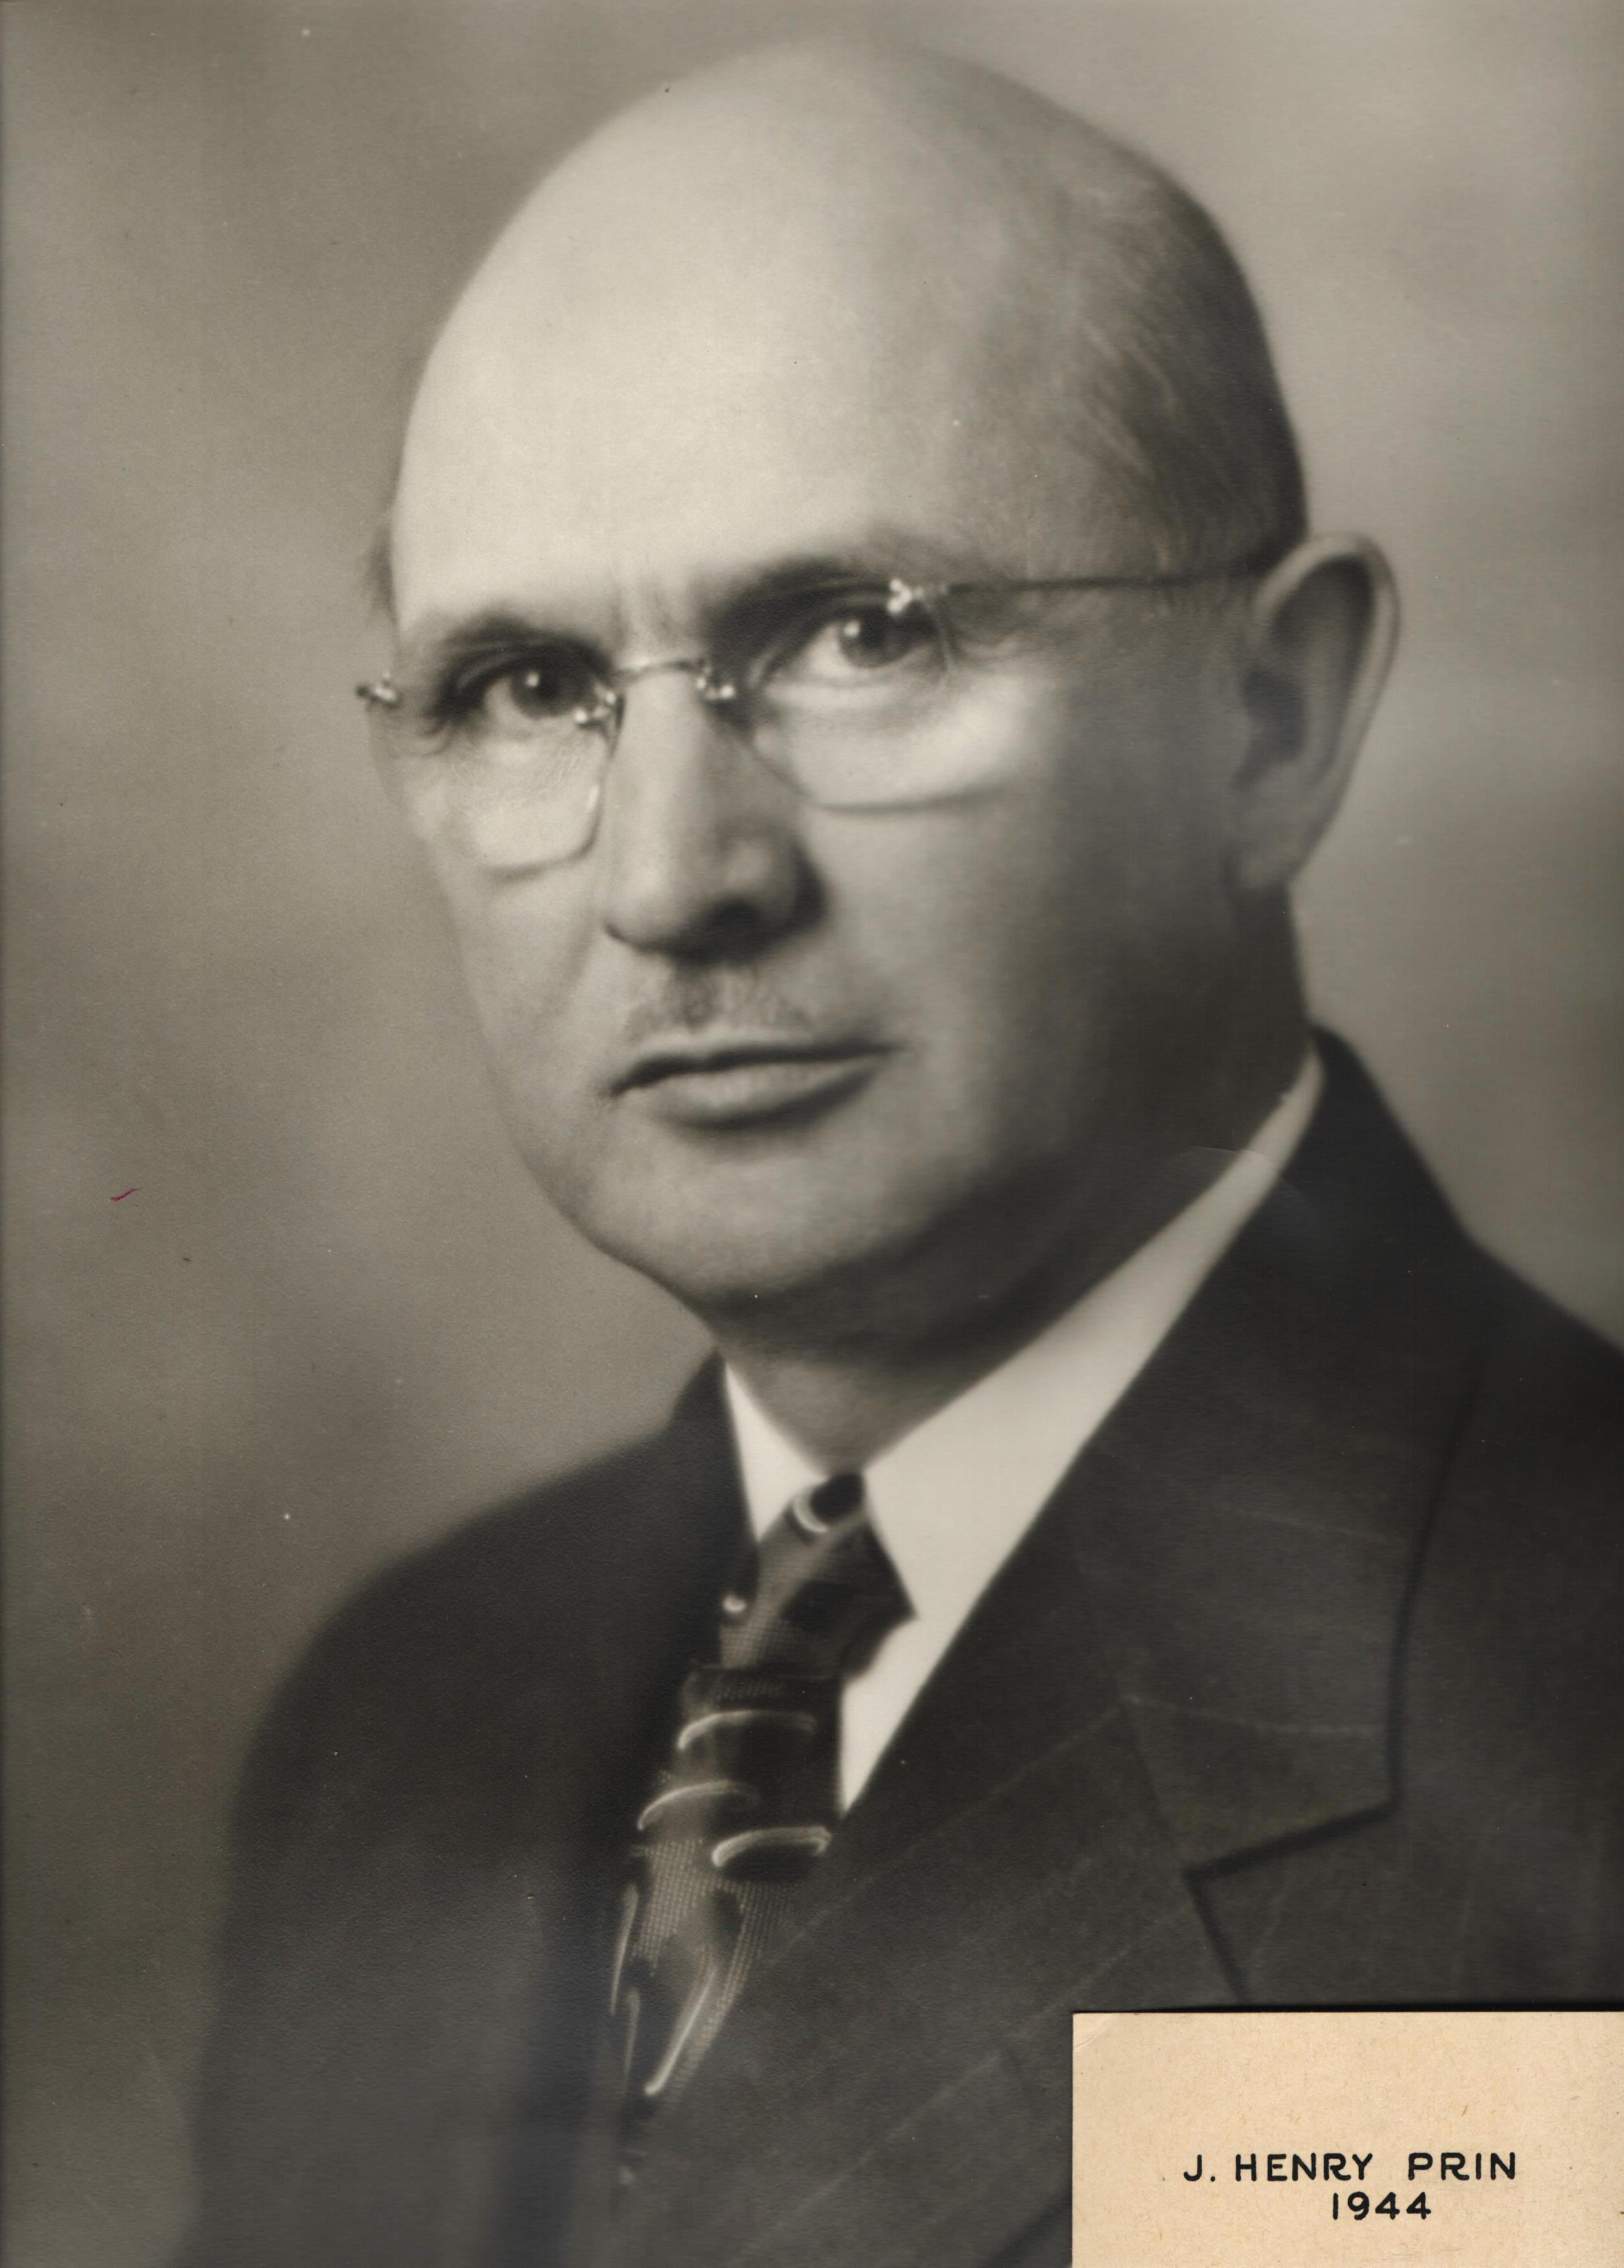 1944 J. Henry Prin